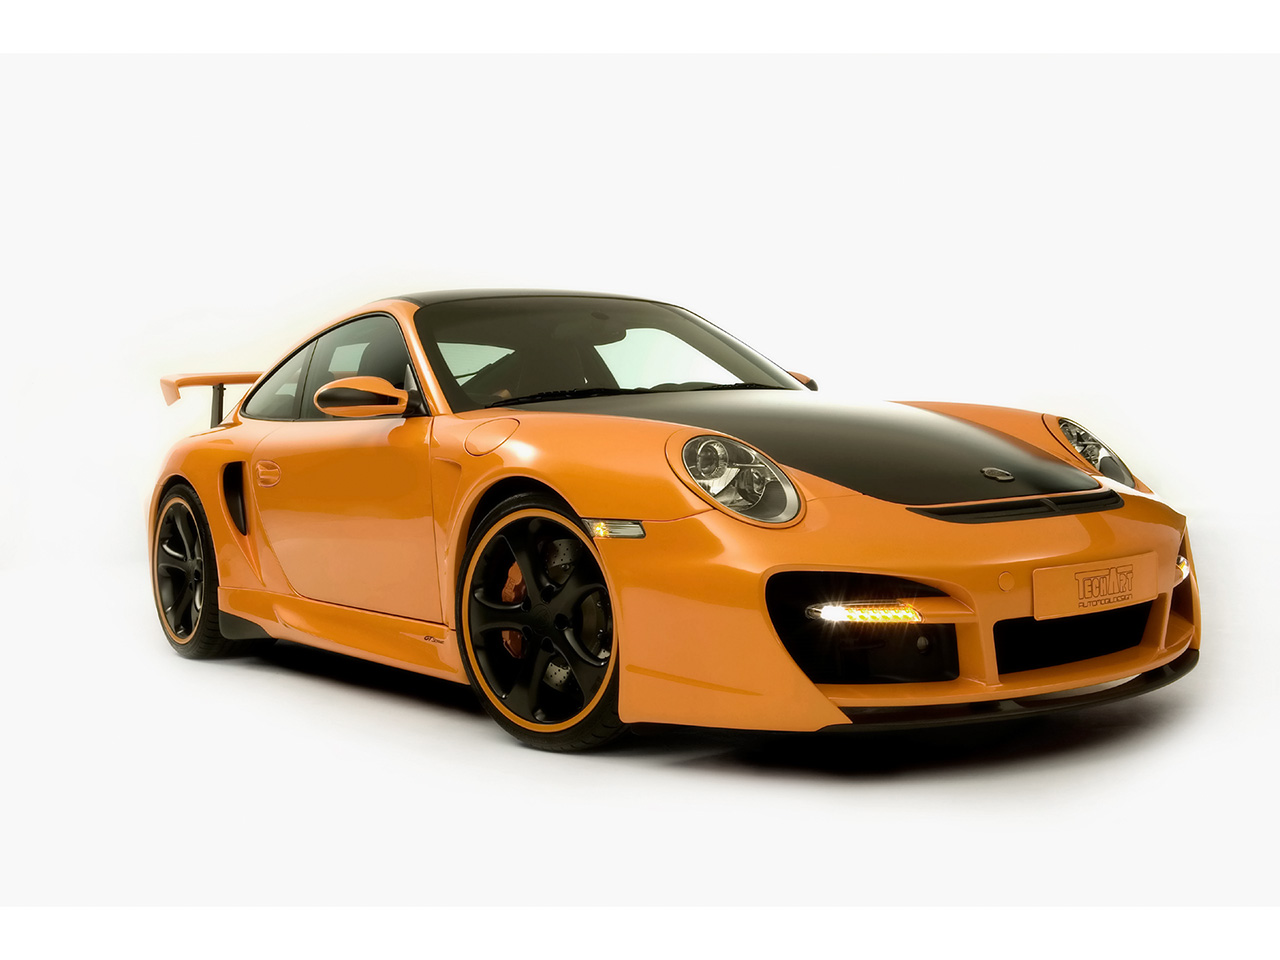 Прикрепленное изображение: 2007_TechArt_GTstreet_based_on_Porsche_911_997_Turbo_Front_And_Side_1280x960.jpg